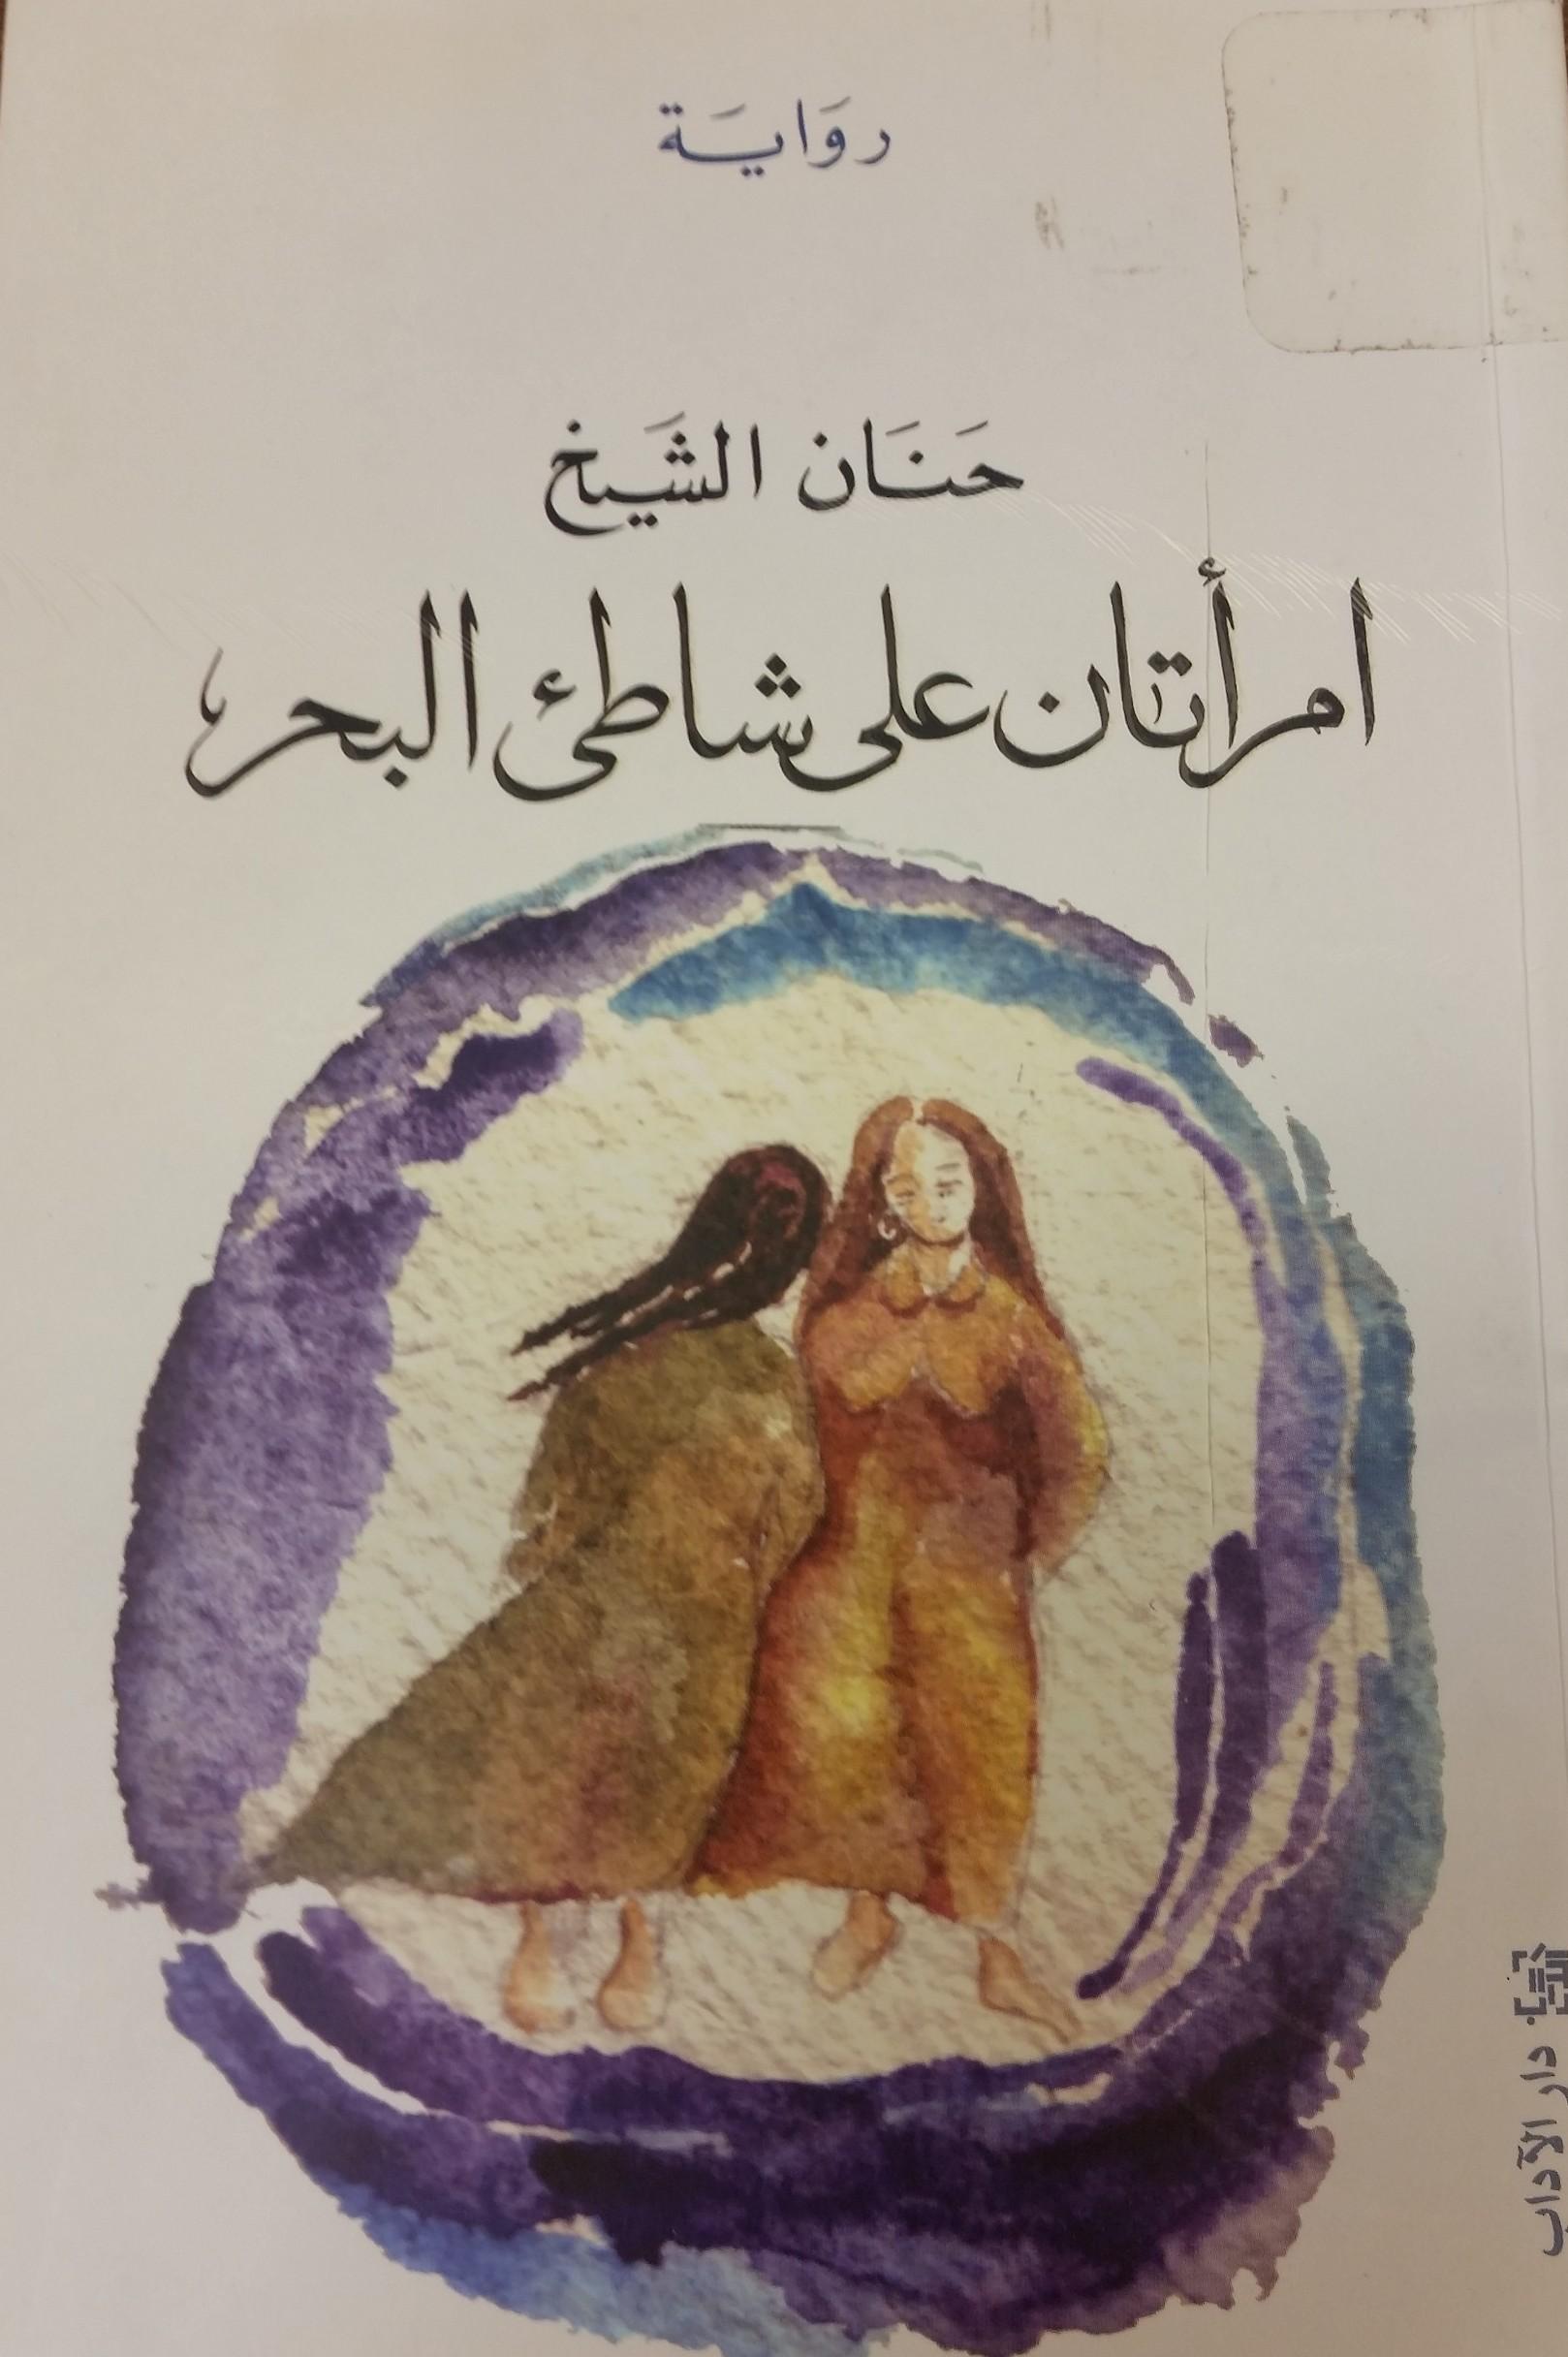 Bayrūt: Dār al-Ādāb, 2003